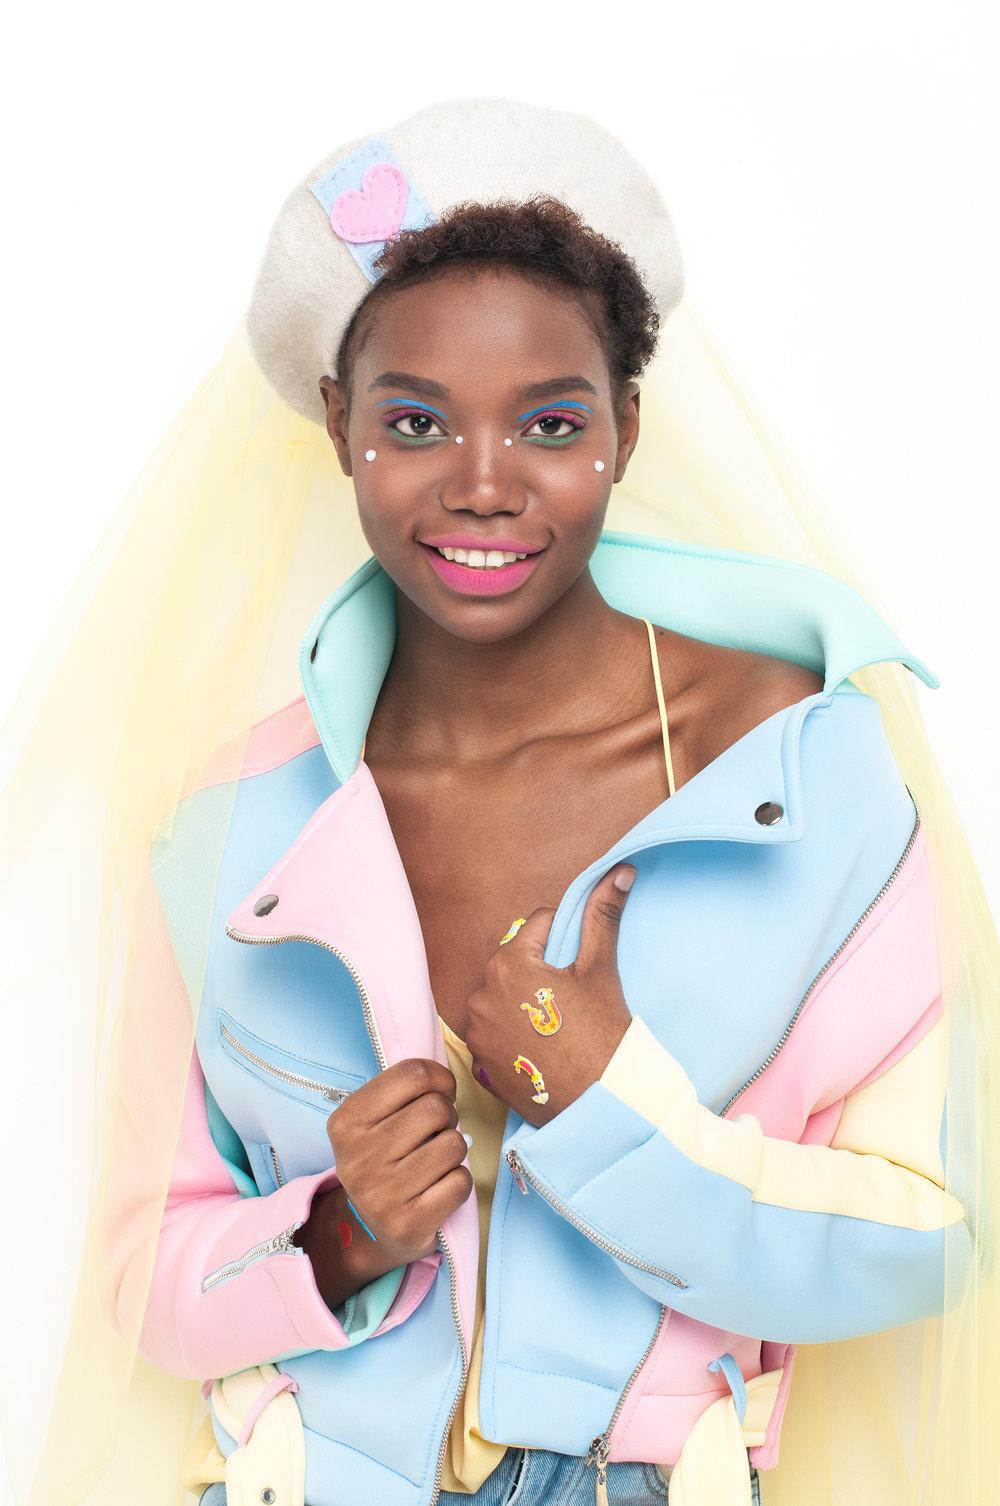 Jacket: #LenaGolova Top: Zara Beret: #LenaGolova Denim shorts: #LenaGolova